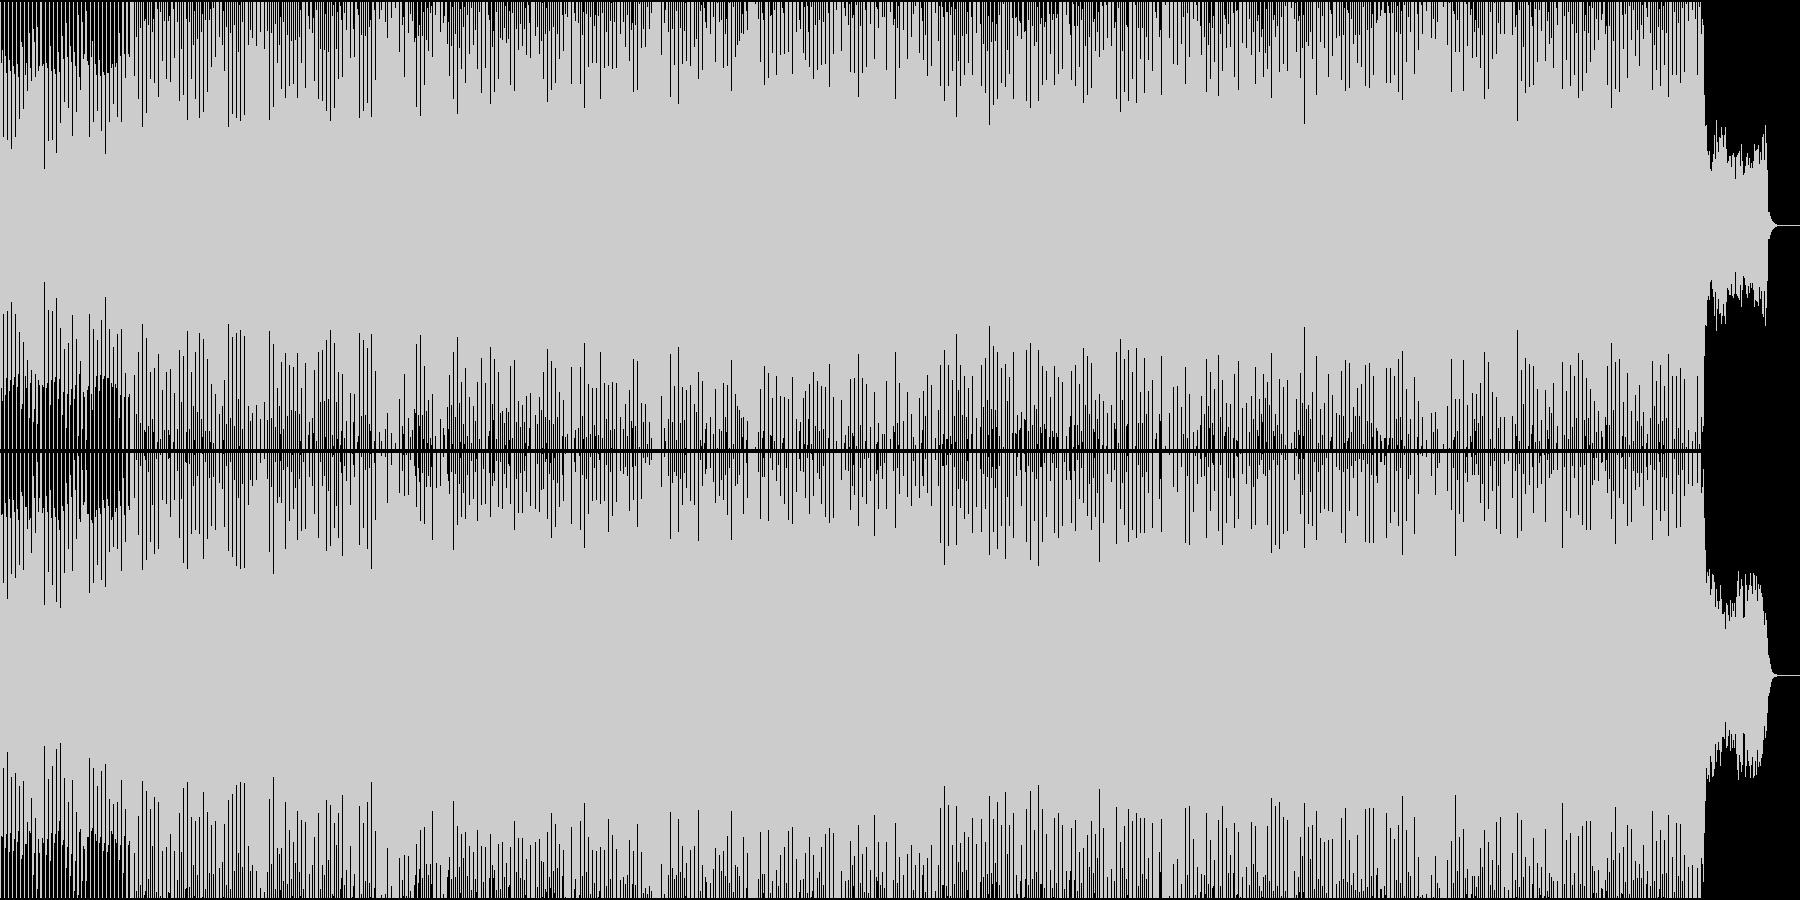 EDMクラブ系、製品紹介、商品紹介-09の未再生の波形